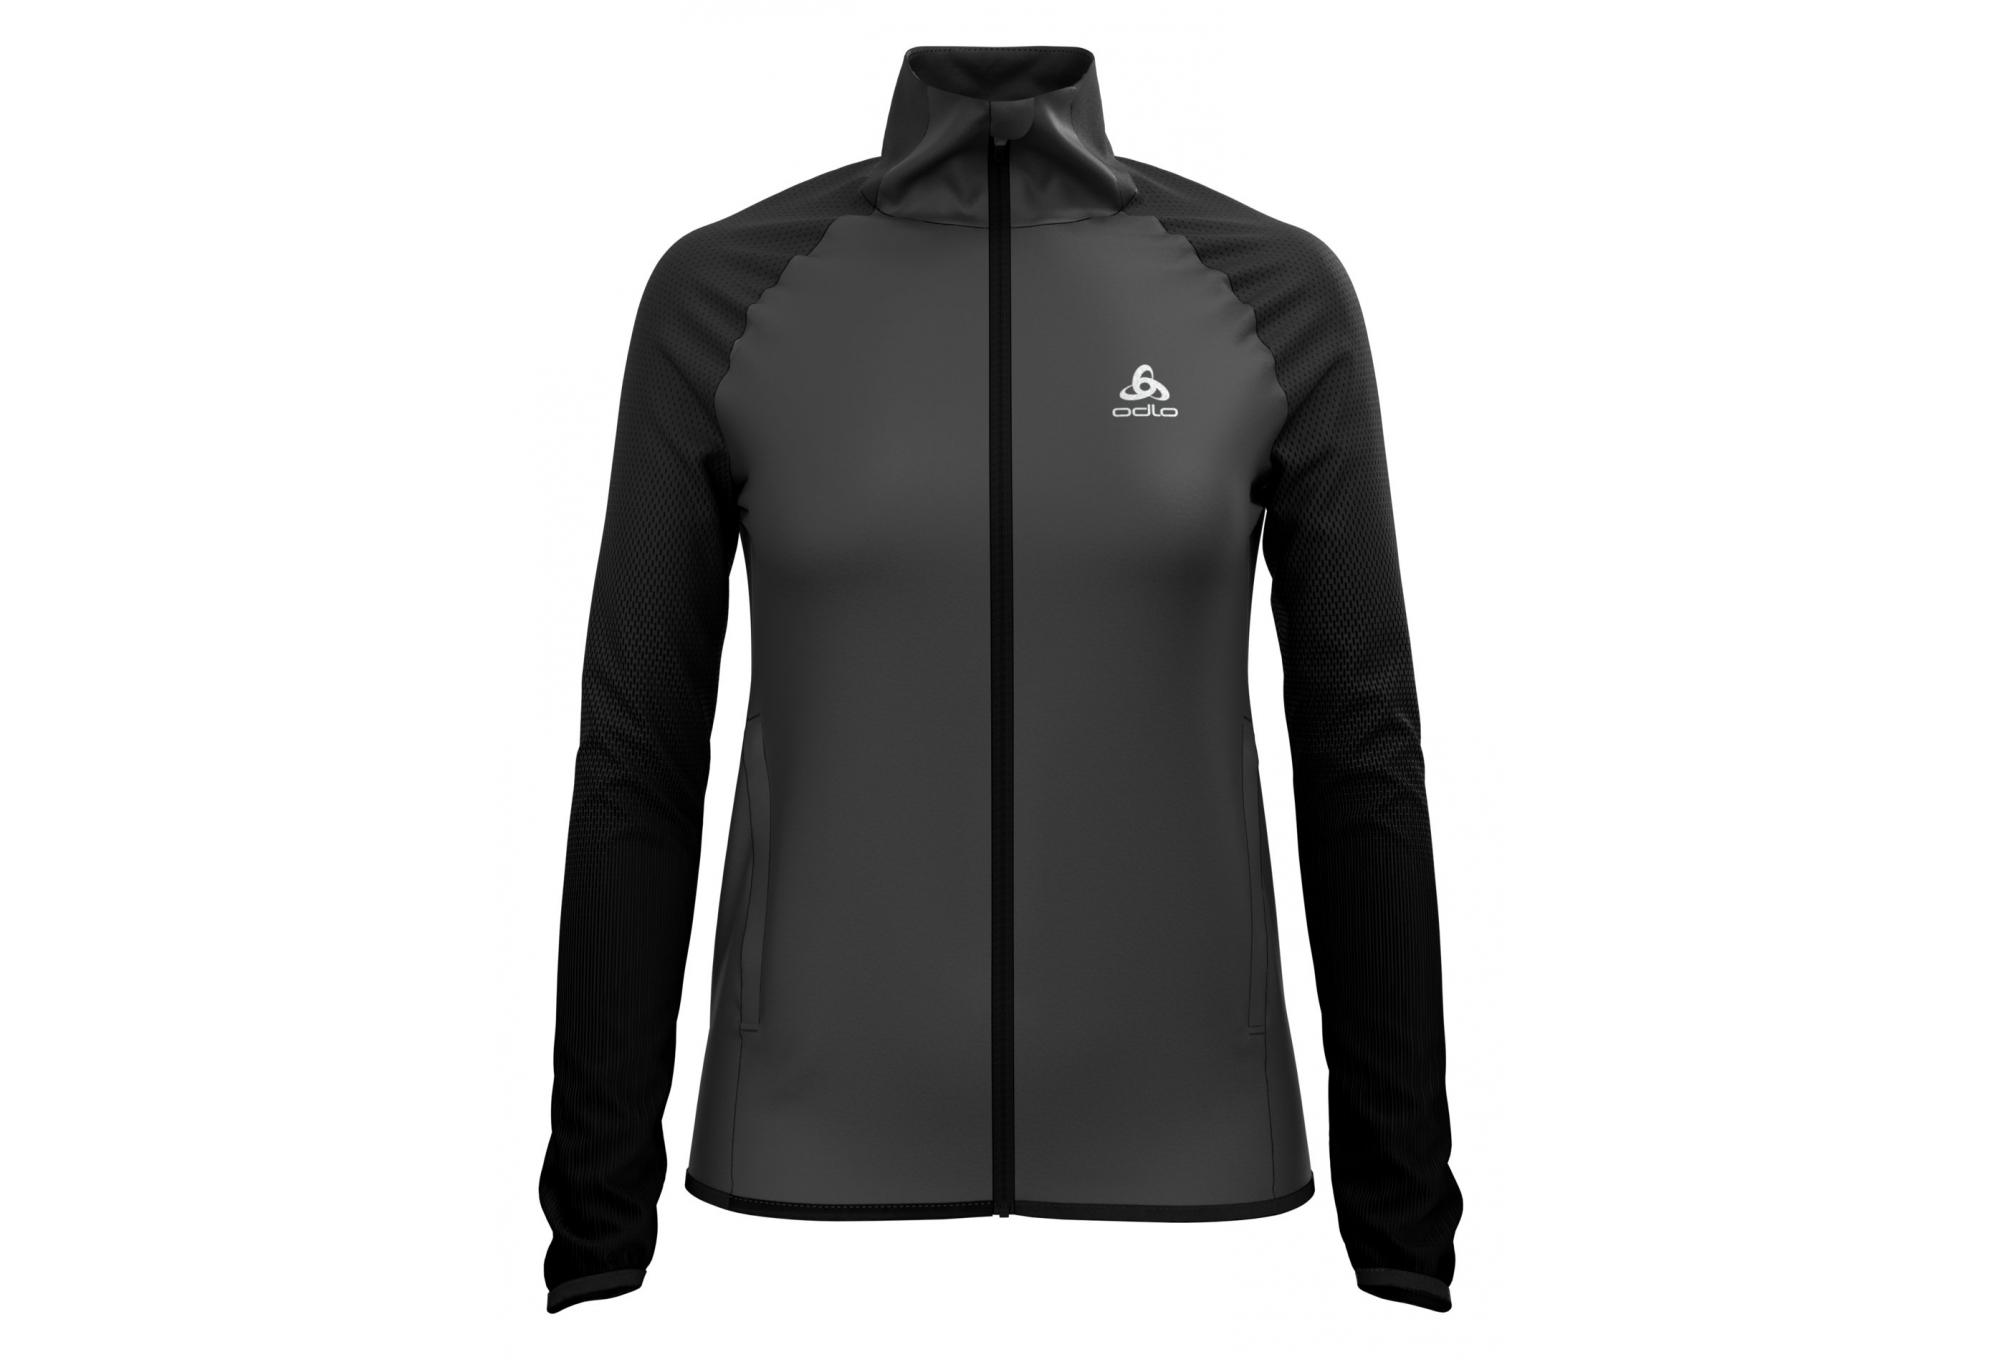 Odlo Jacket Zeroweight Windproof Warm Jacket Femme